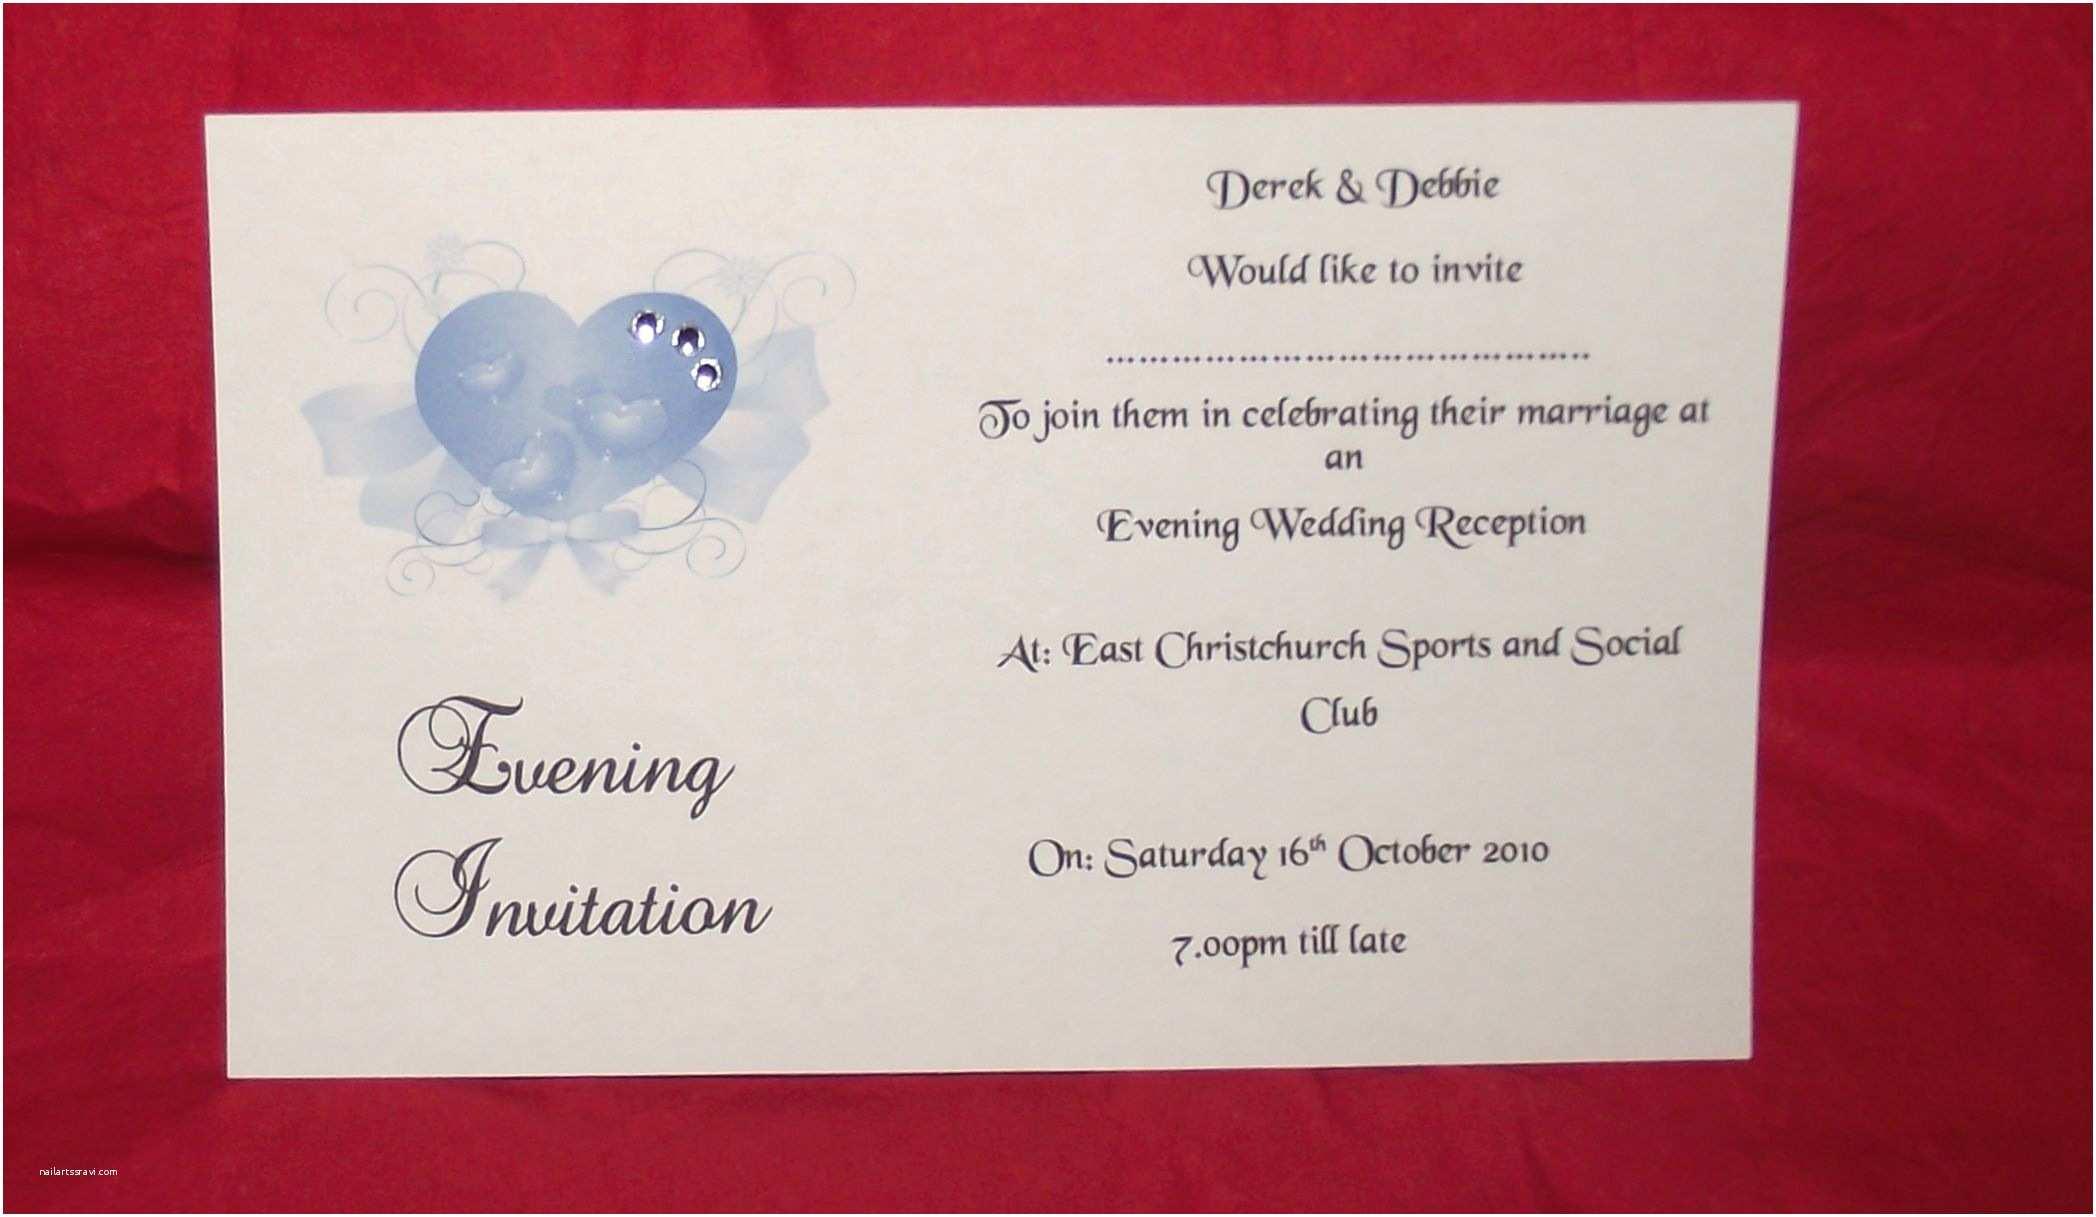 Personalised Wedding Invitations Wedding Invitations Day or evening Personalised Elegant